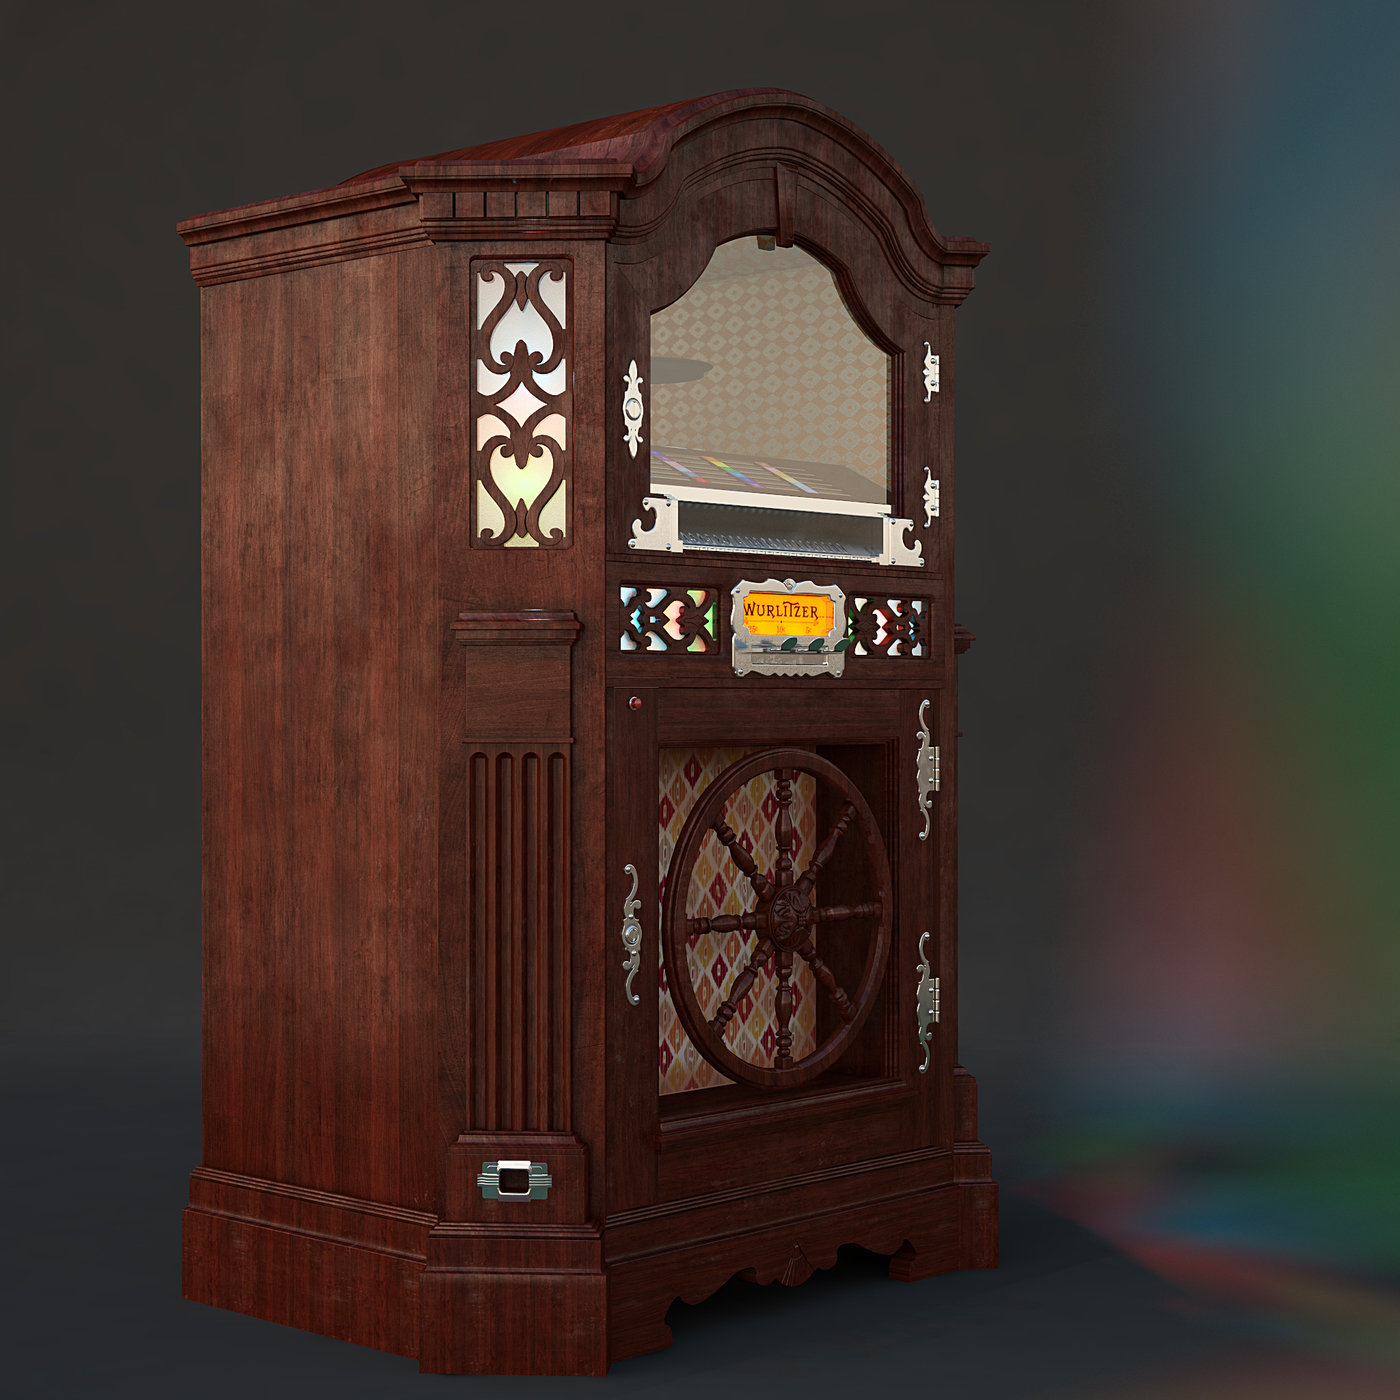 Wurlitzer Model 780 Jukebox By Robert Korsantes At